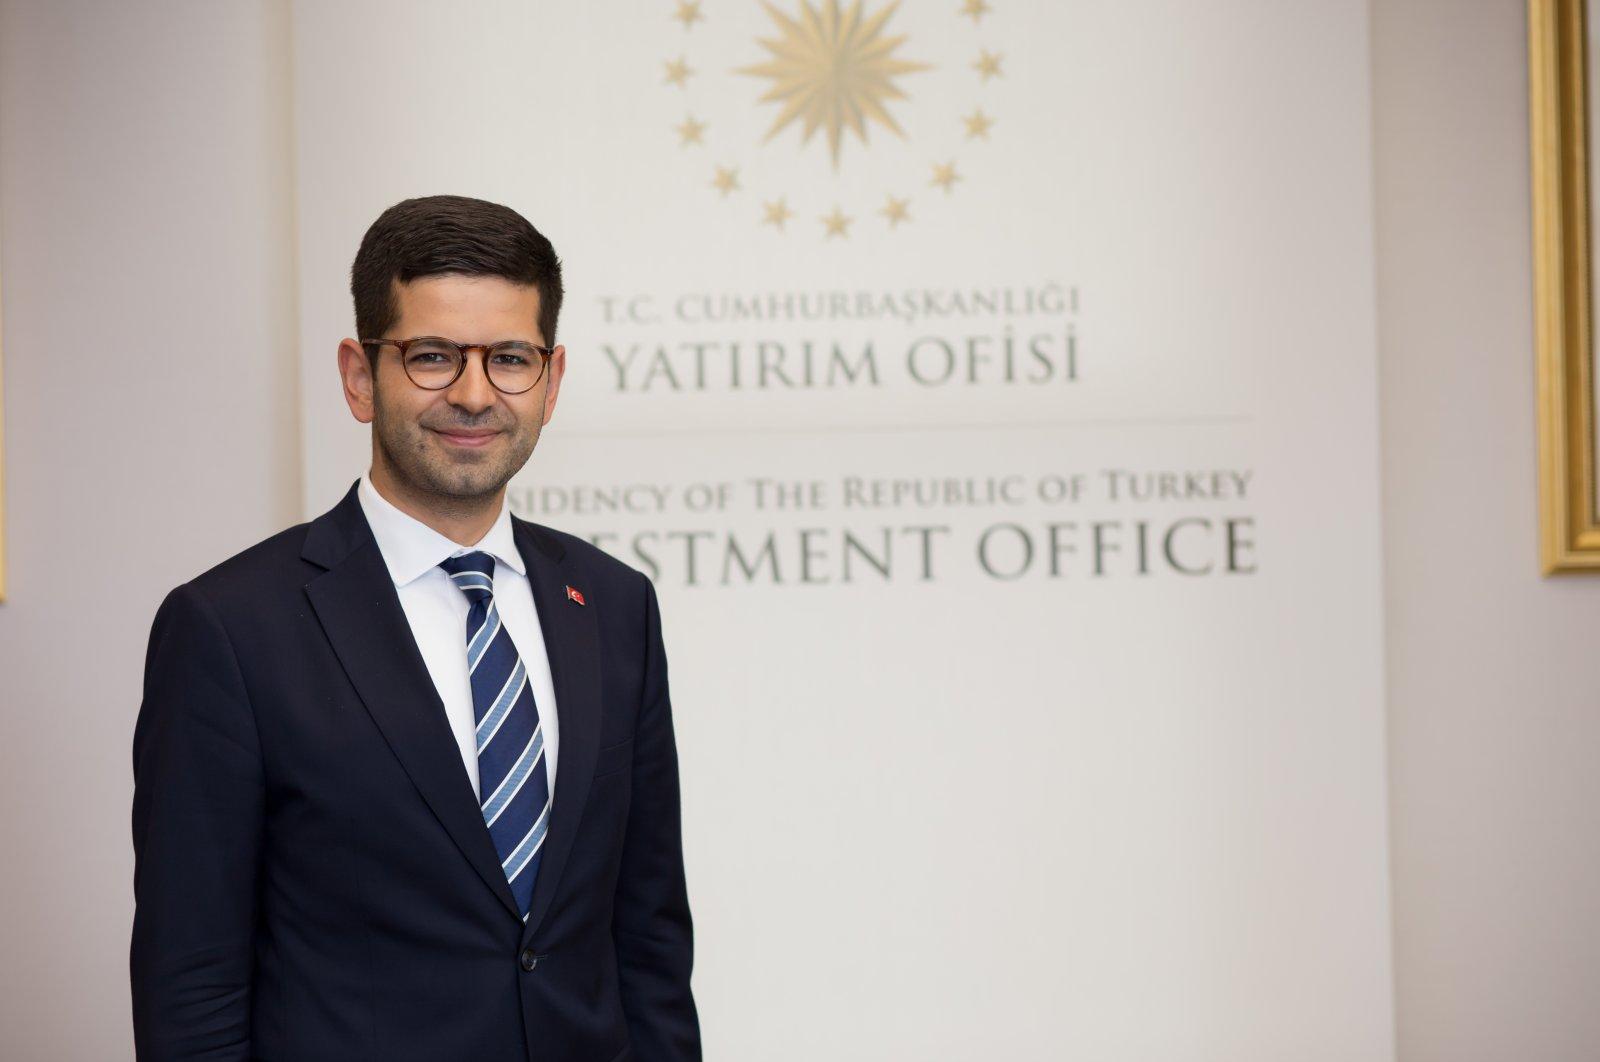 The Turkish Presidency's Investment Office Chairman Burak Dağlıoğlu, Aug. 20, 2020. (Sabah Photo by Saffet Azak)